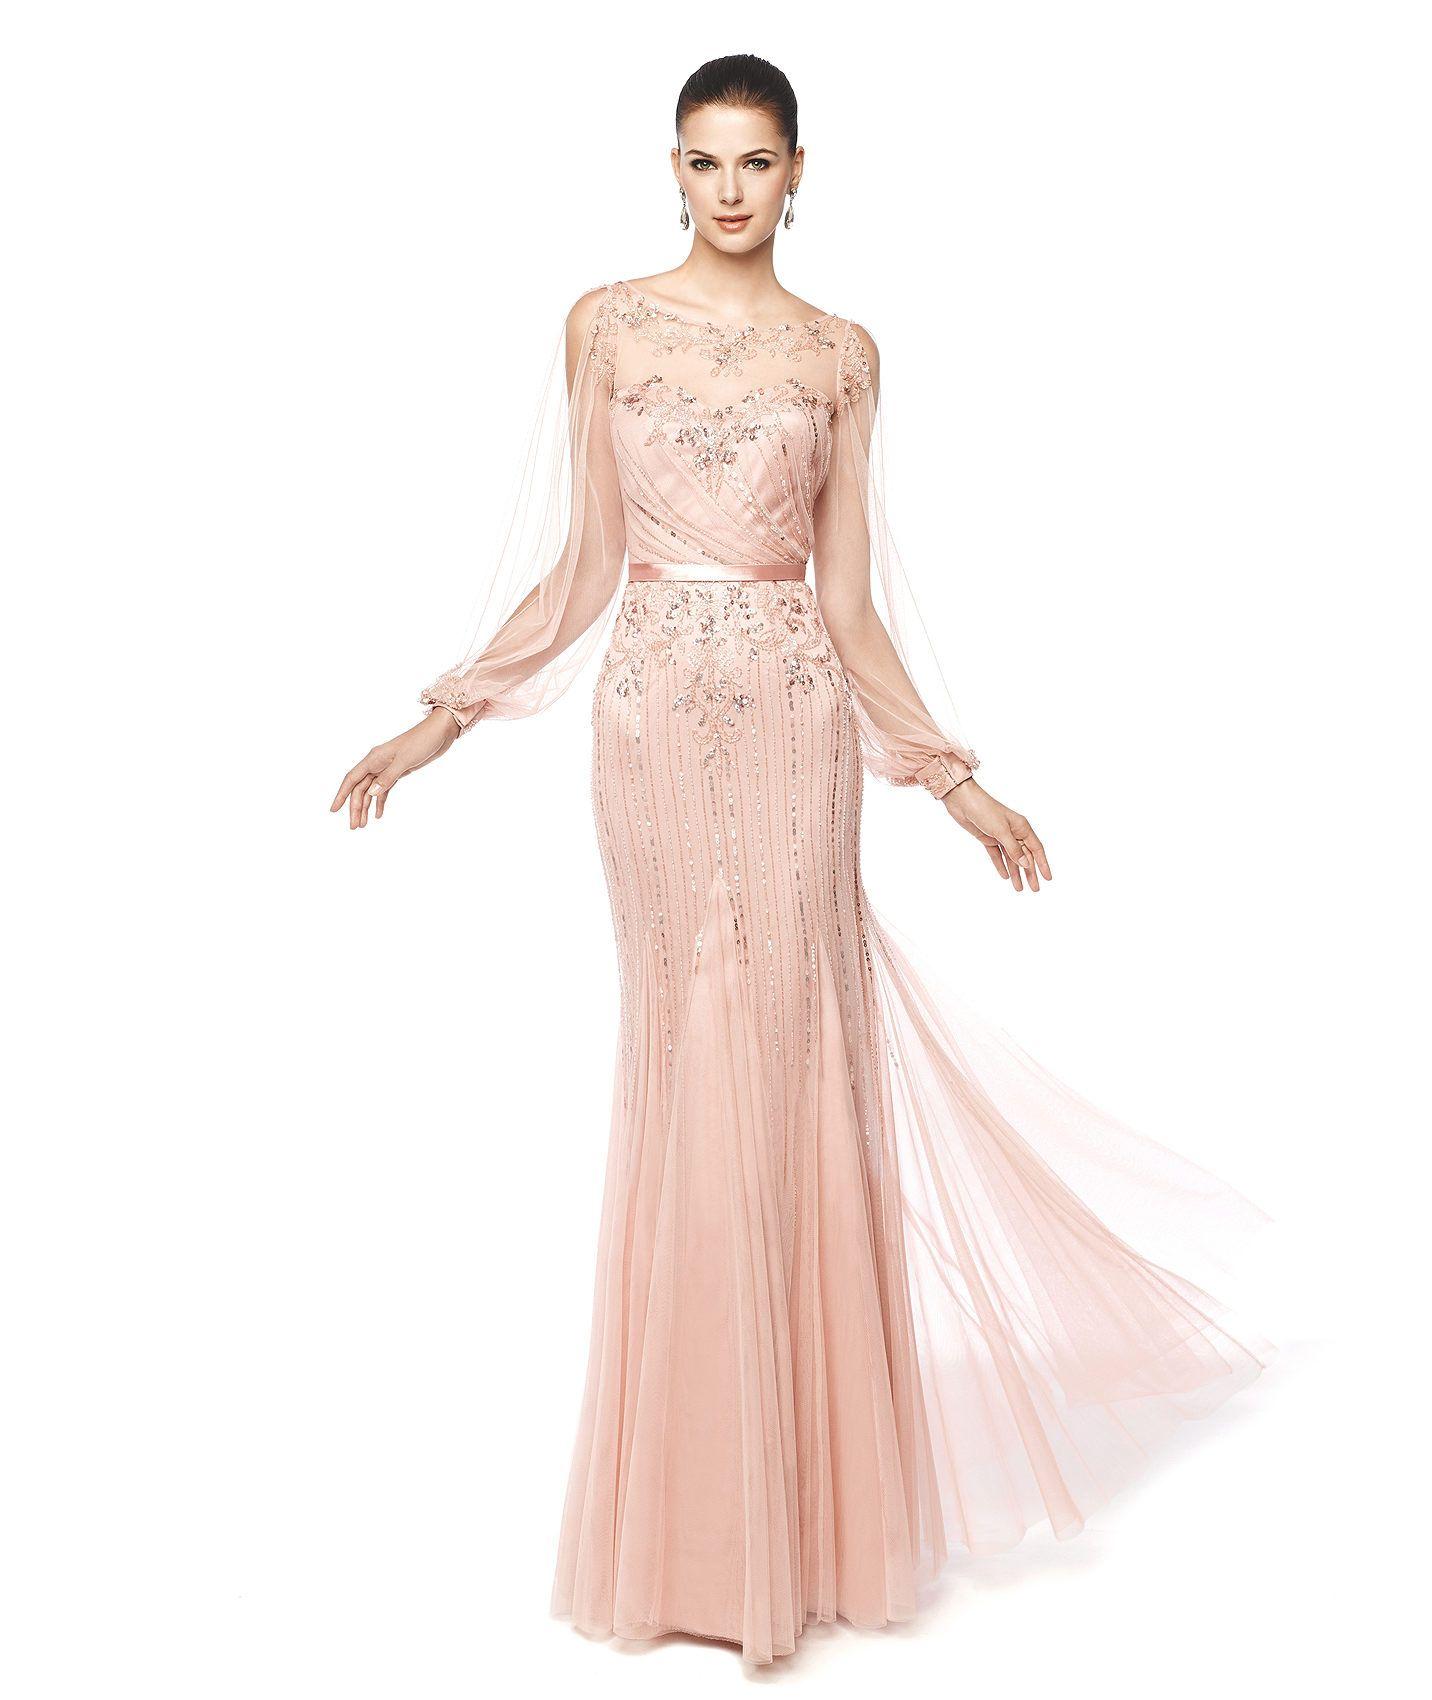 Pin by karyne yamamoto on vestidos pinterest gemstone gowns and